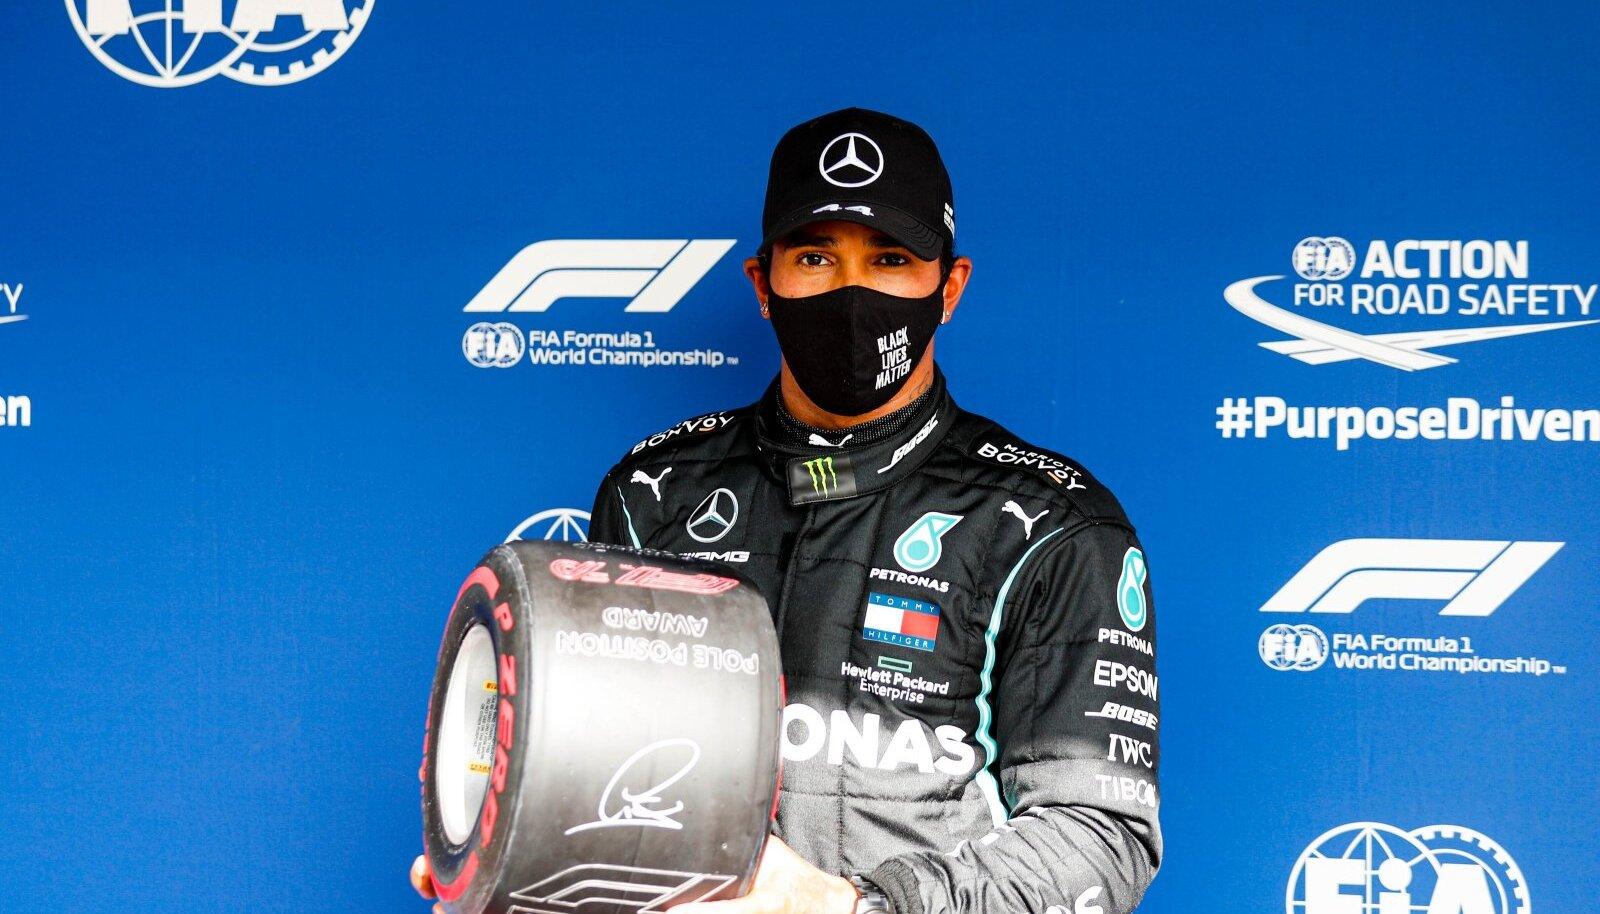 Motorsports: FIA Formula One World Championship, WM, Weltmeisterschaft 2020, Grand Prix of Portugal Motorsports: FIA Fo